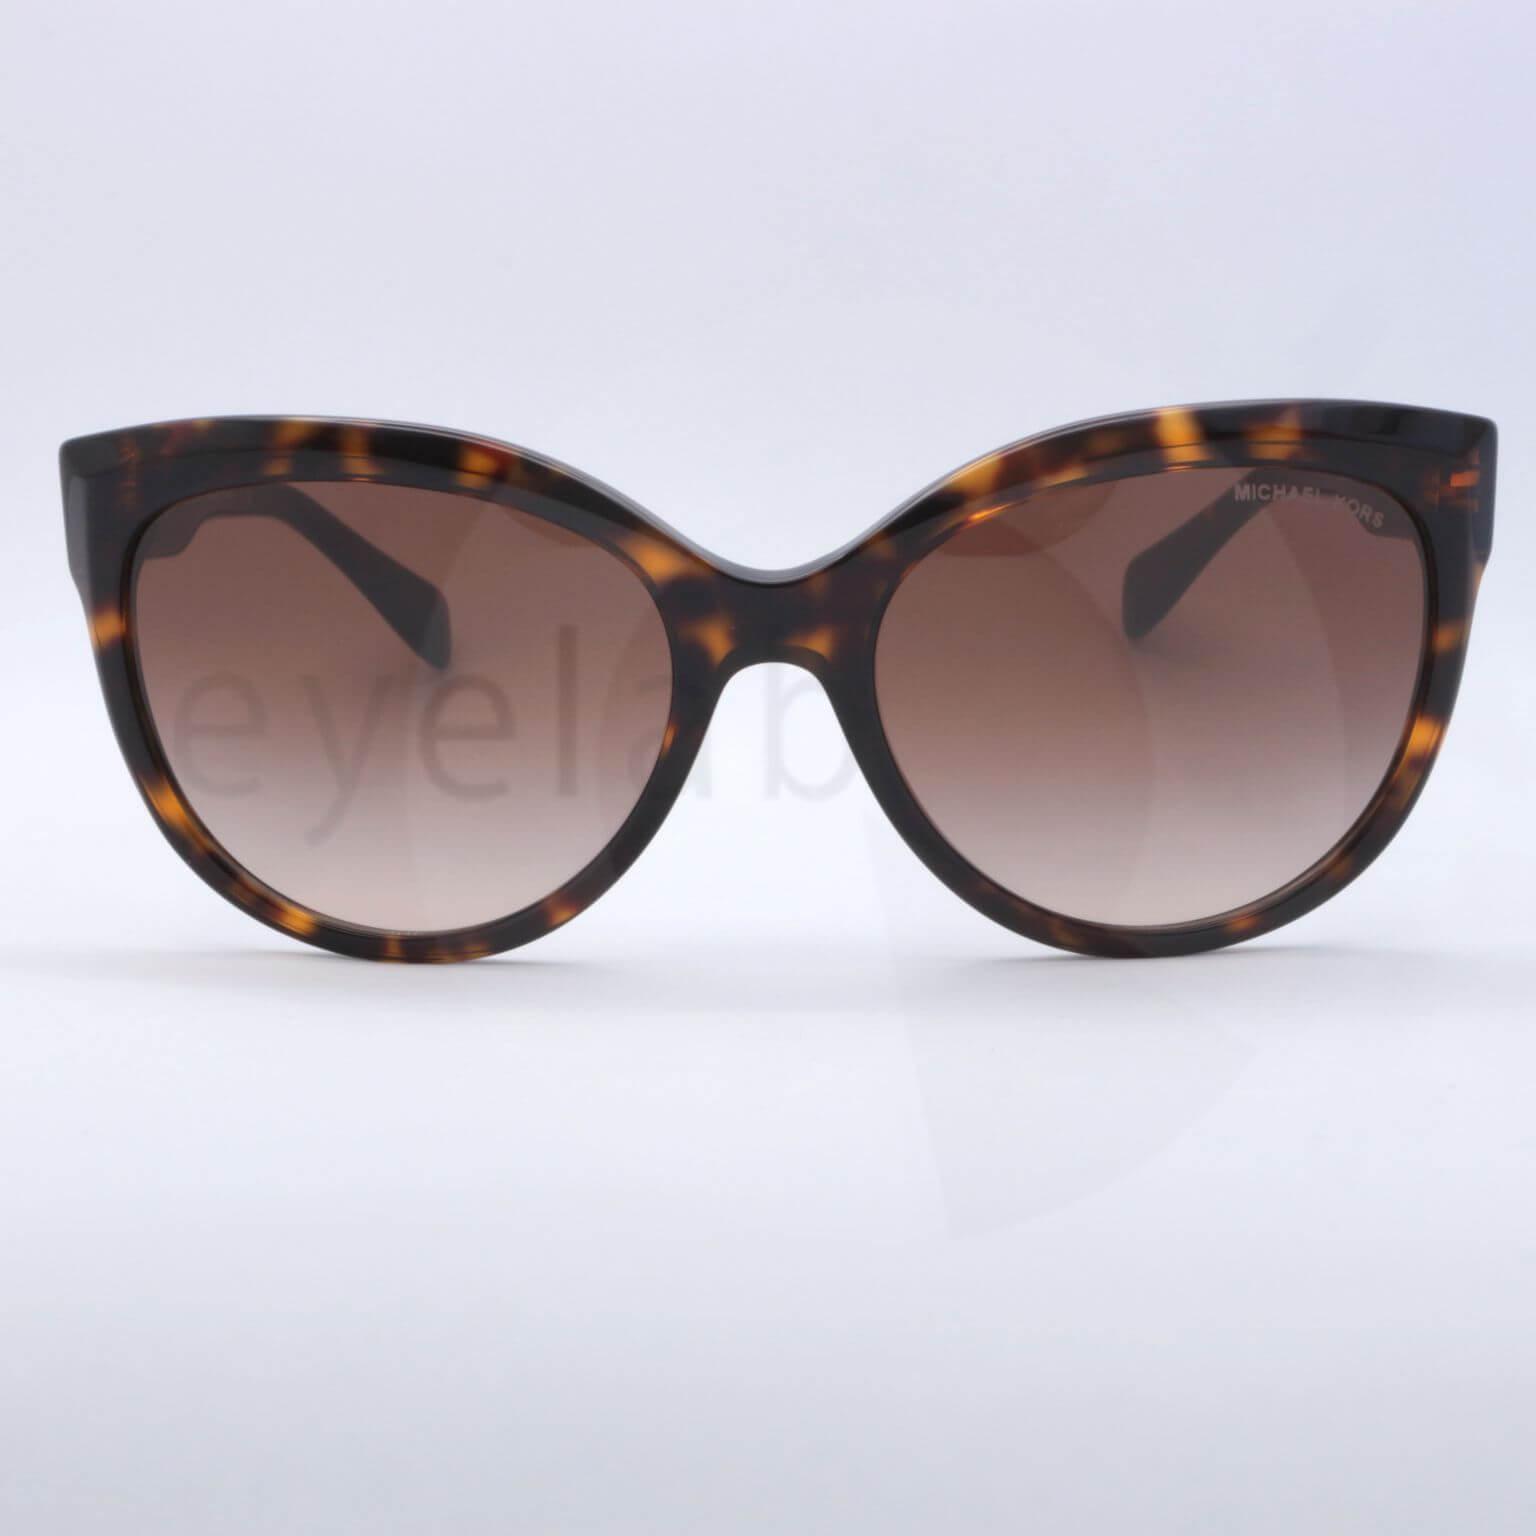 b55d8e76a9 Γυαλιά ηλίου Michael Kors 2083 Portillo 300613 ~ Eyelab